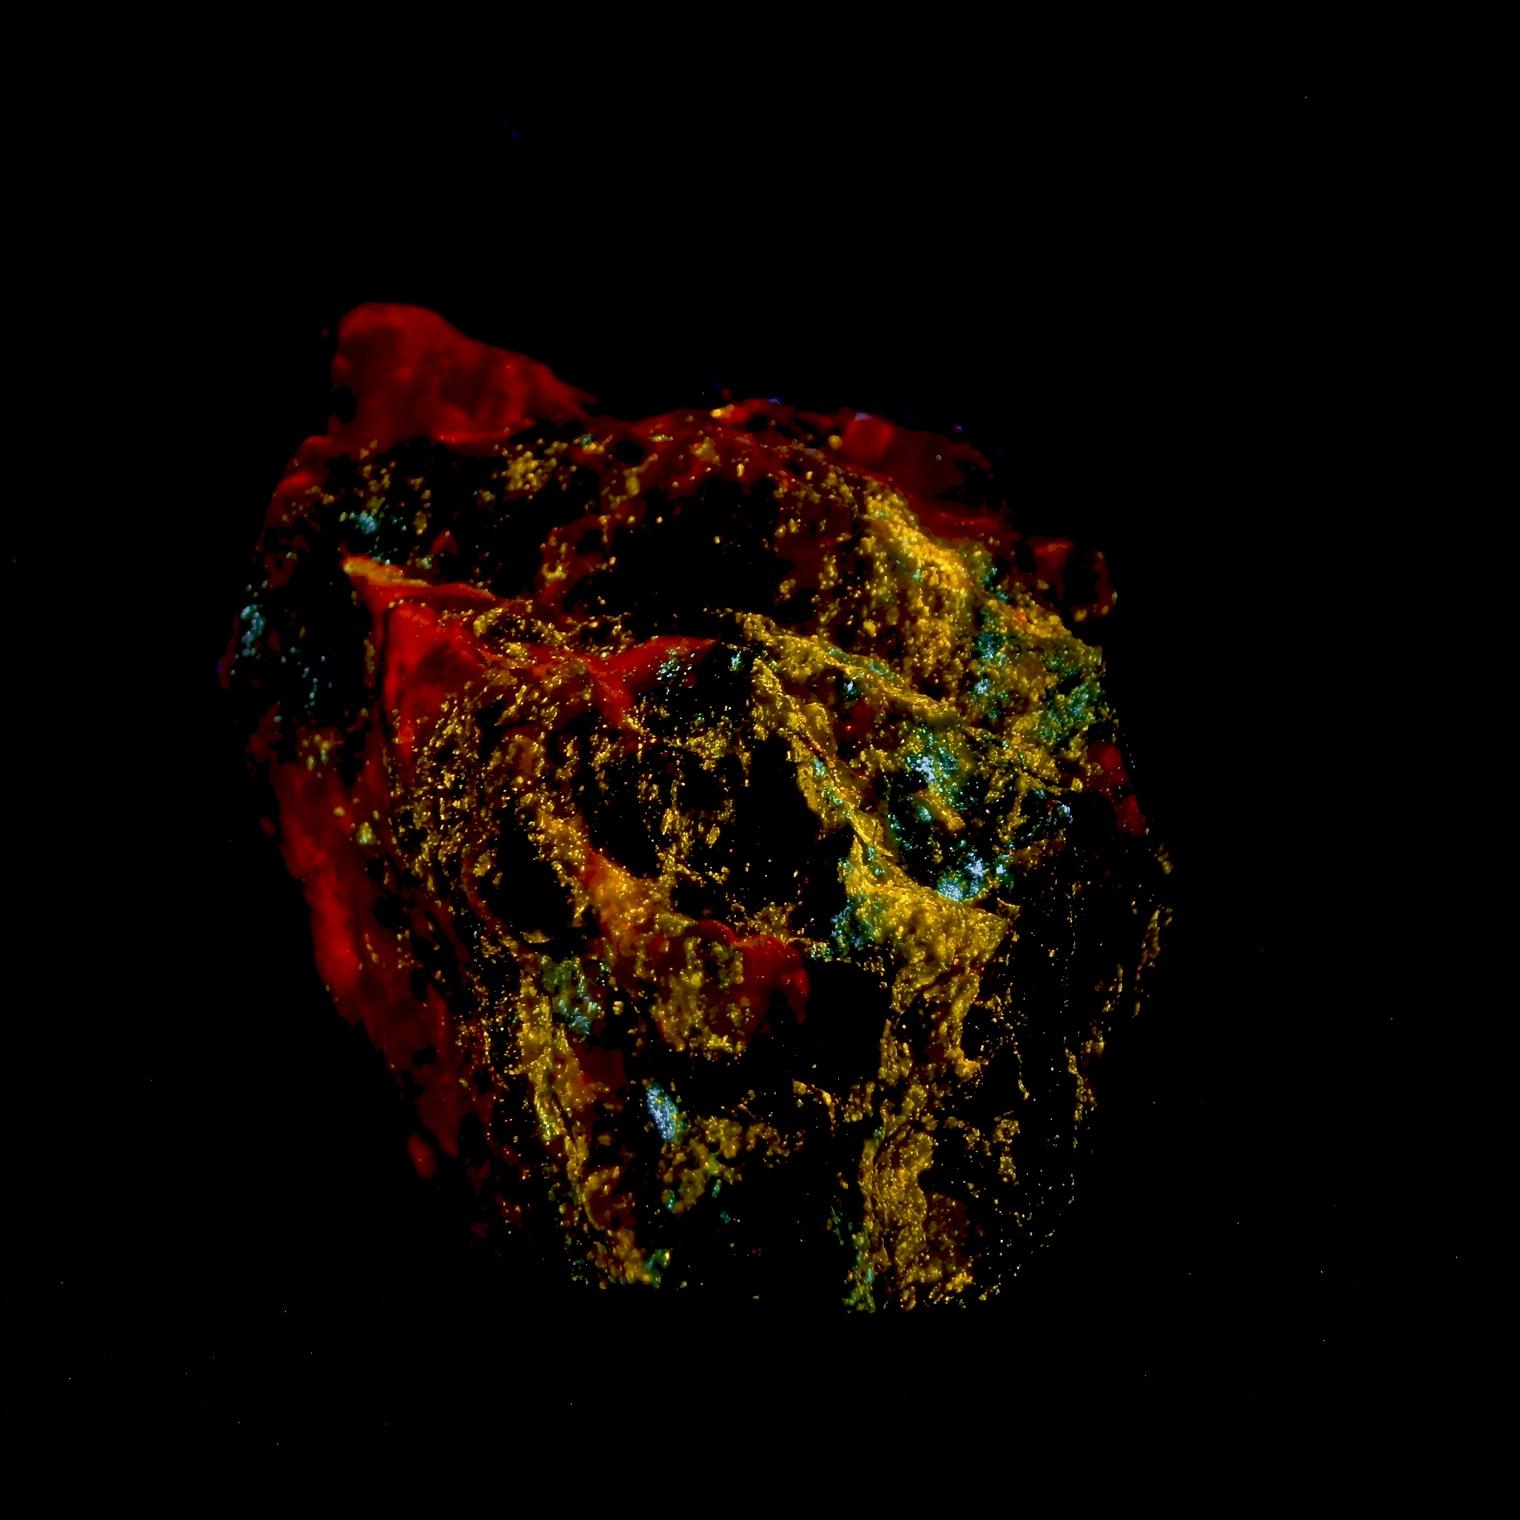 Colección de Minerales Fluorescentes - Página 5 Fullsi44